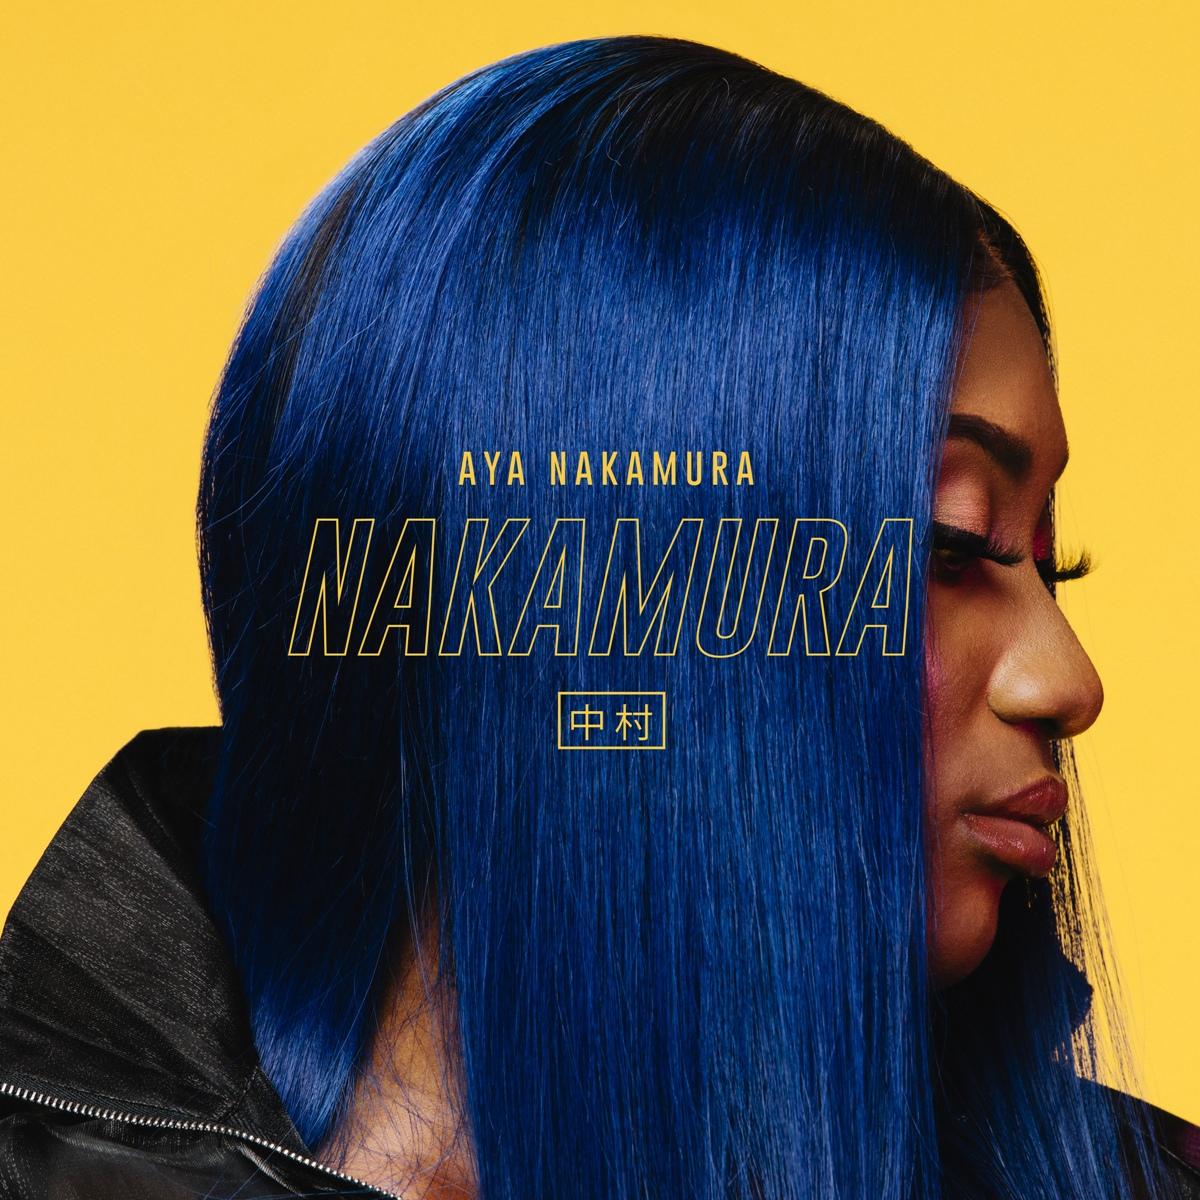 Aya Nakamura - Pookie (Clip officiel)